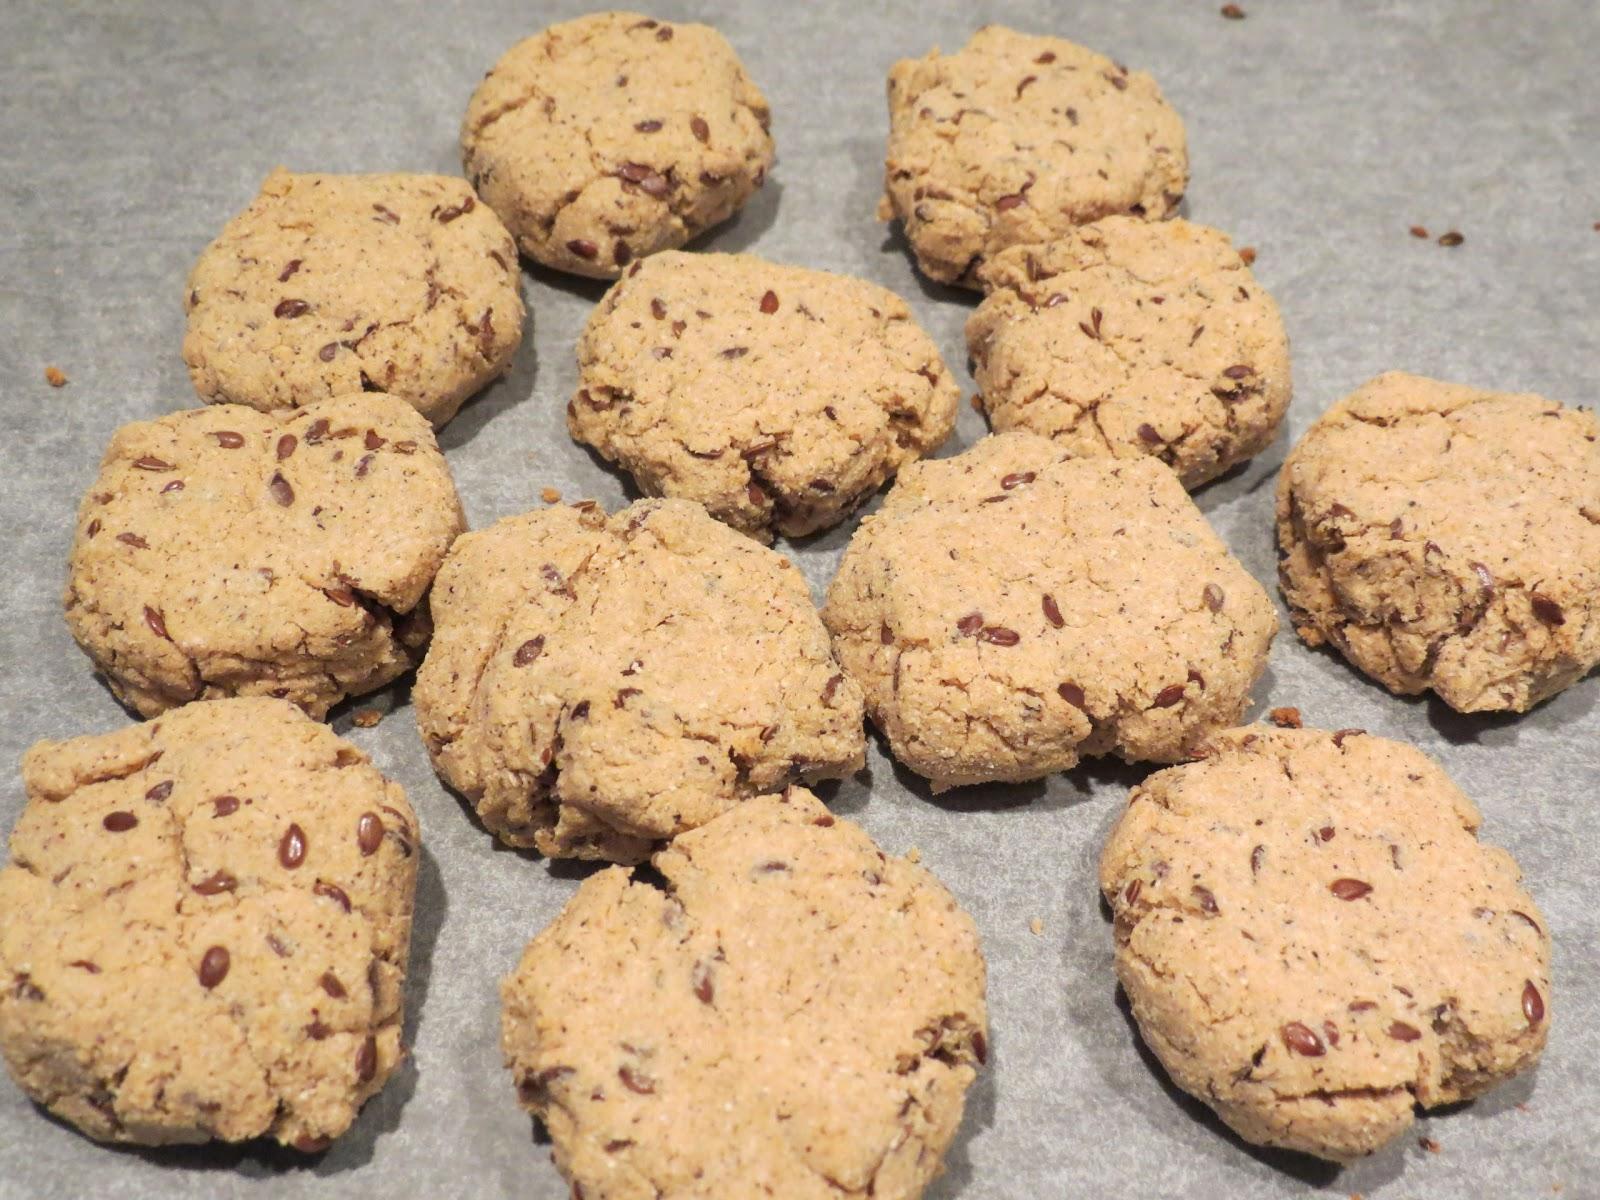 Cookies recept utan ägg